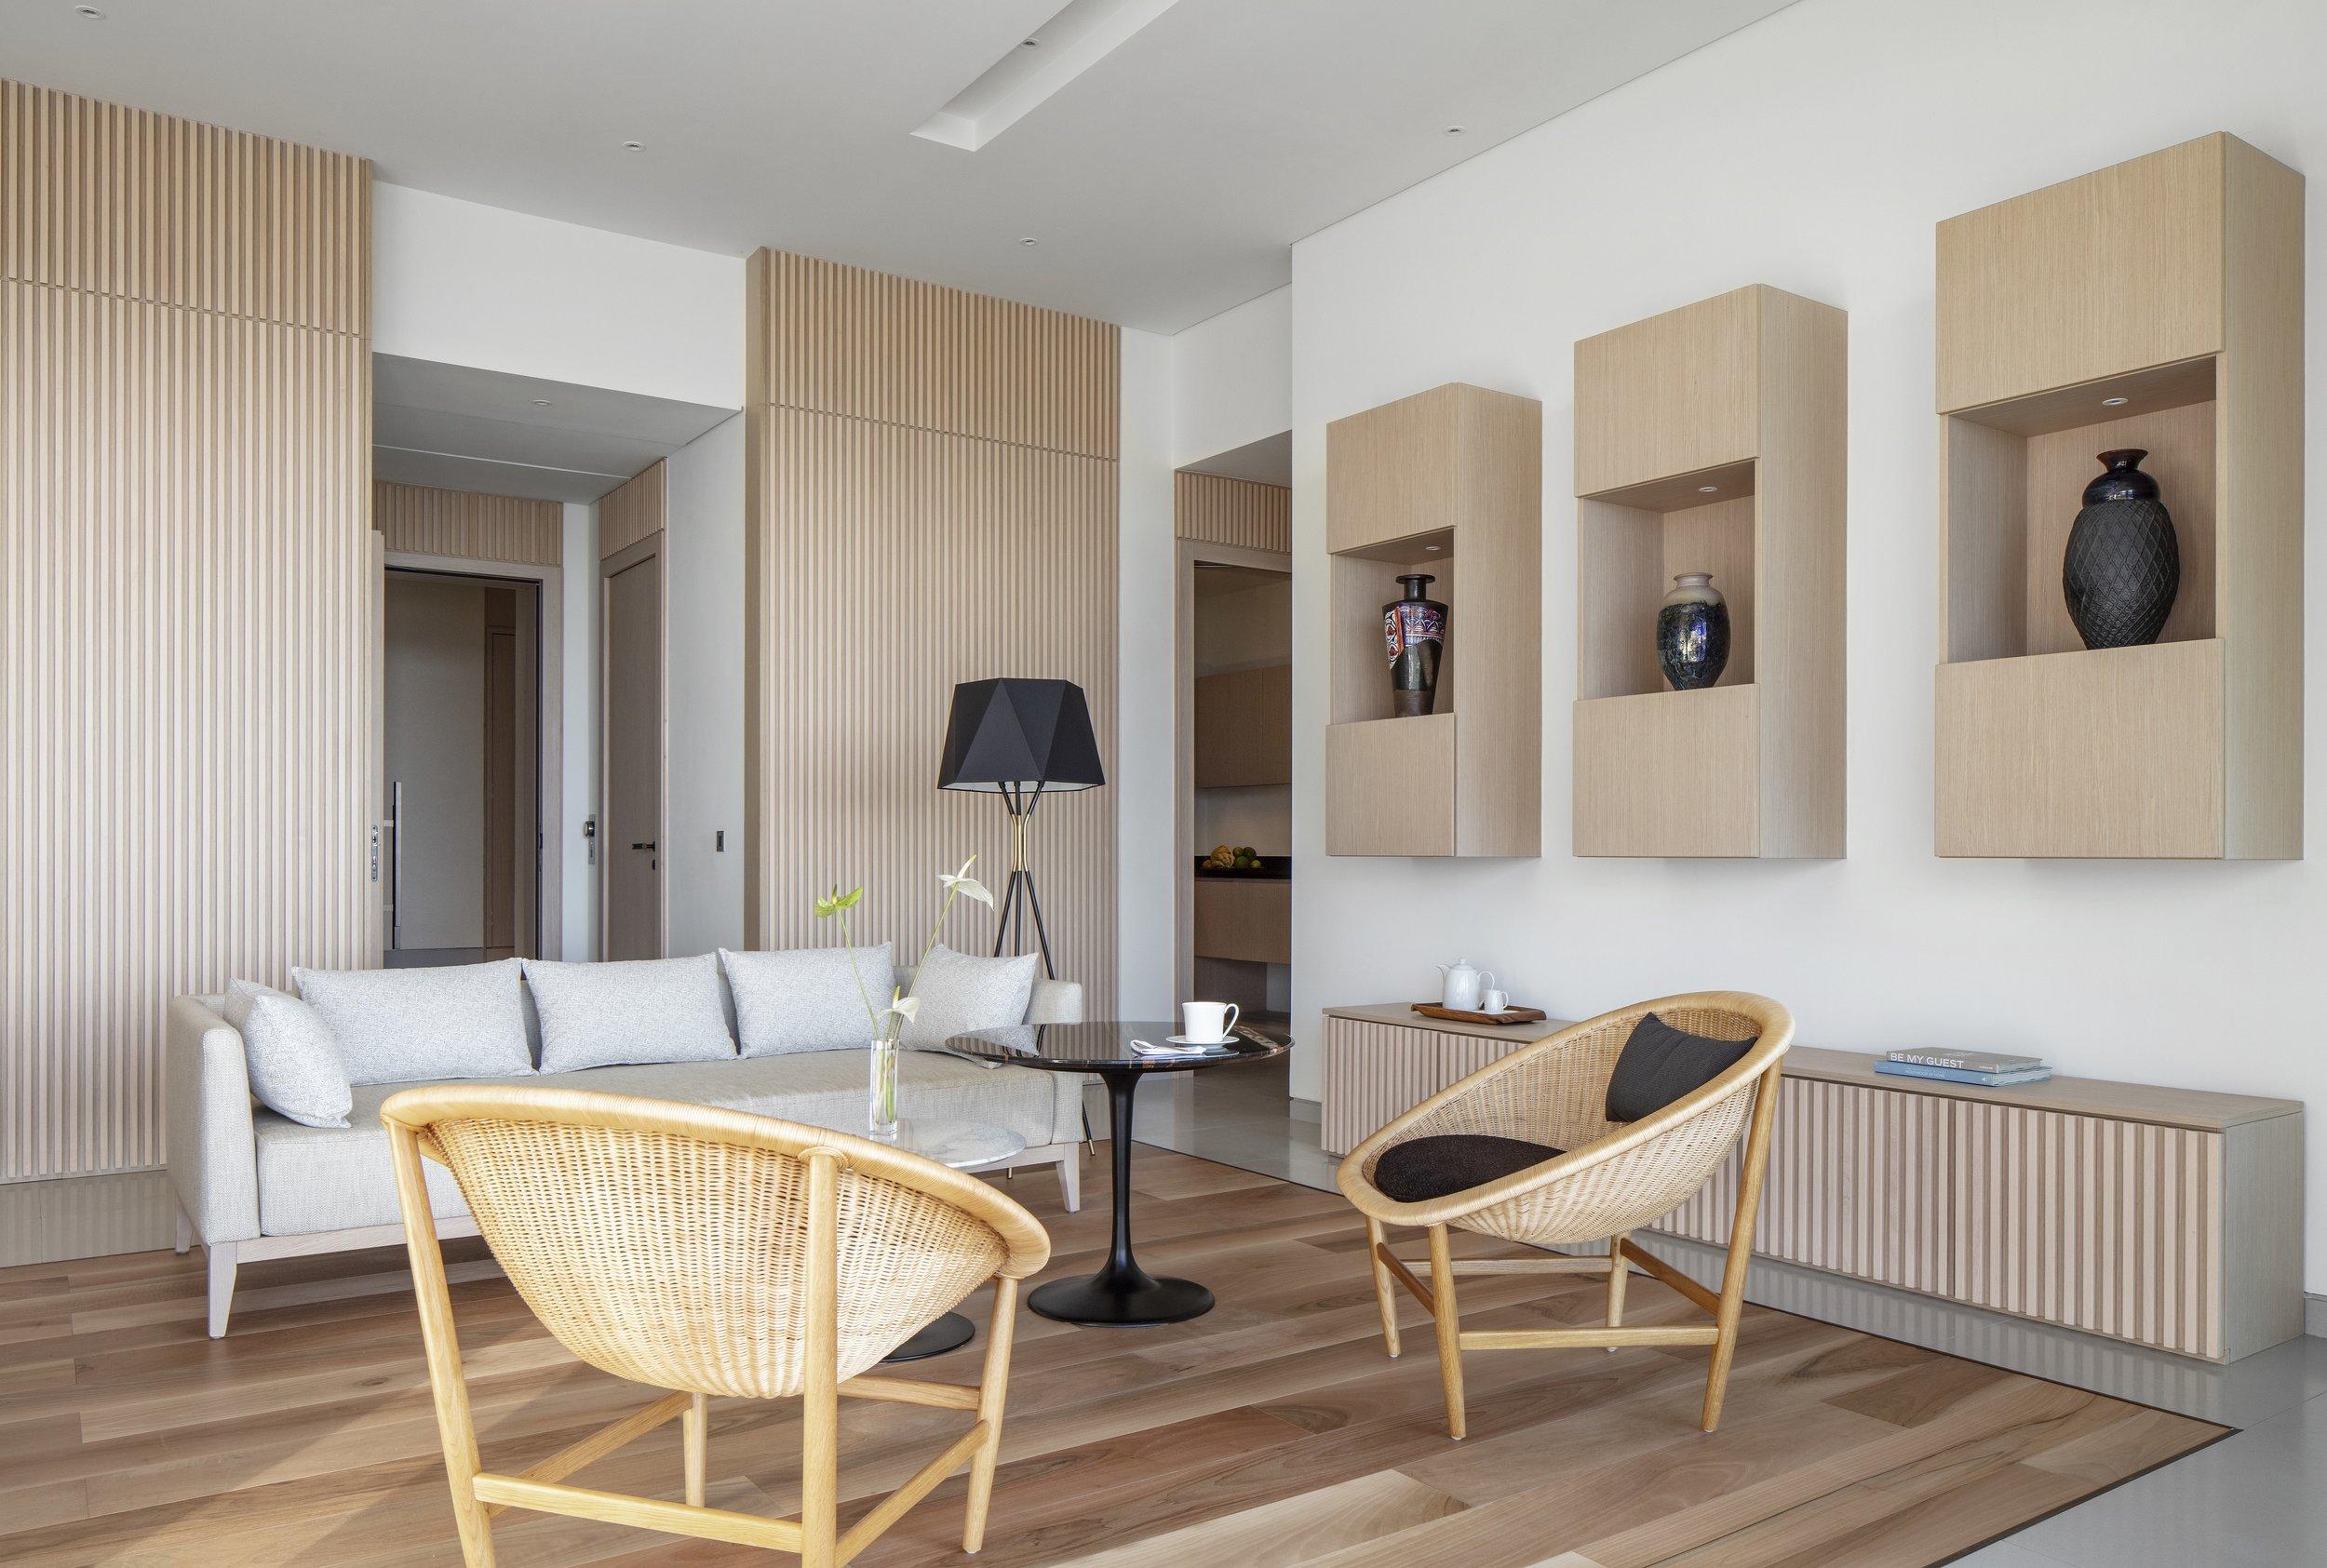 One Bedroom Suite living room area.jpg